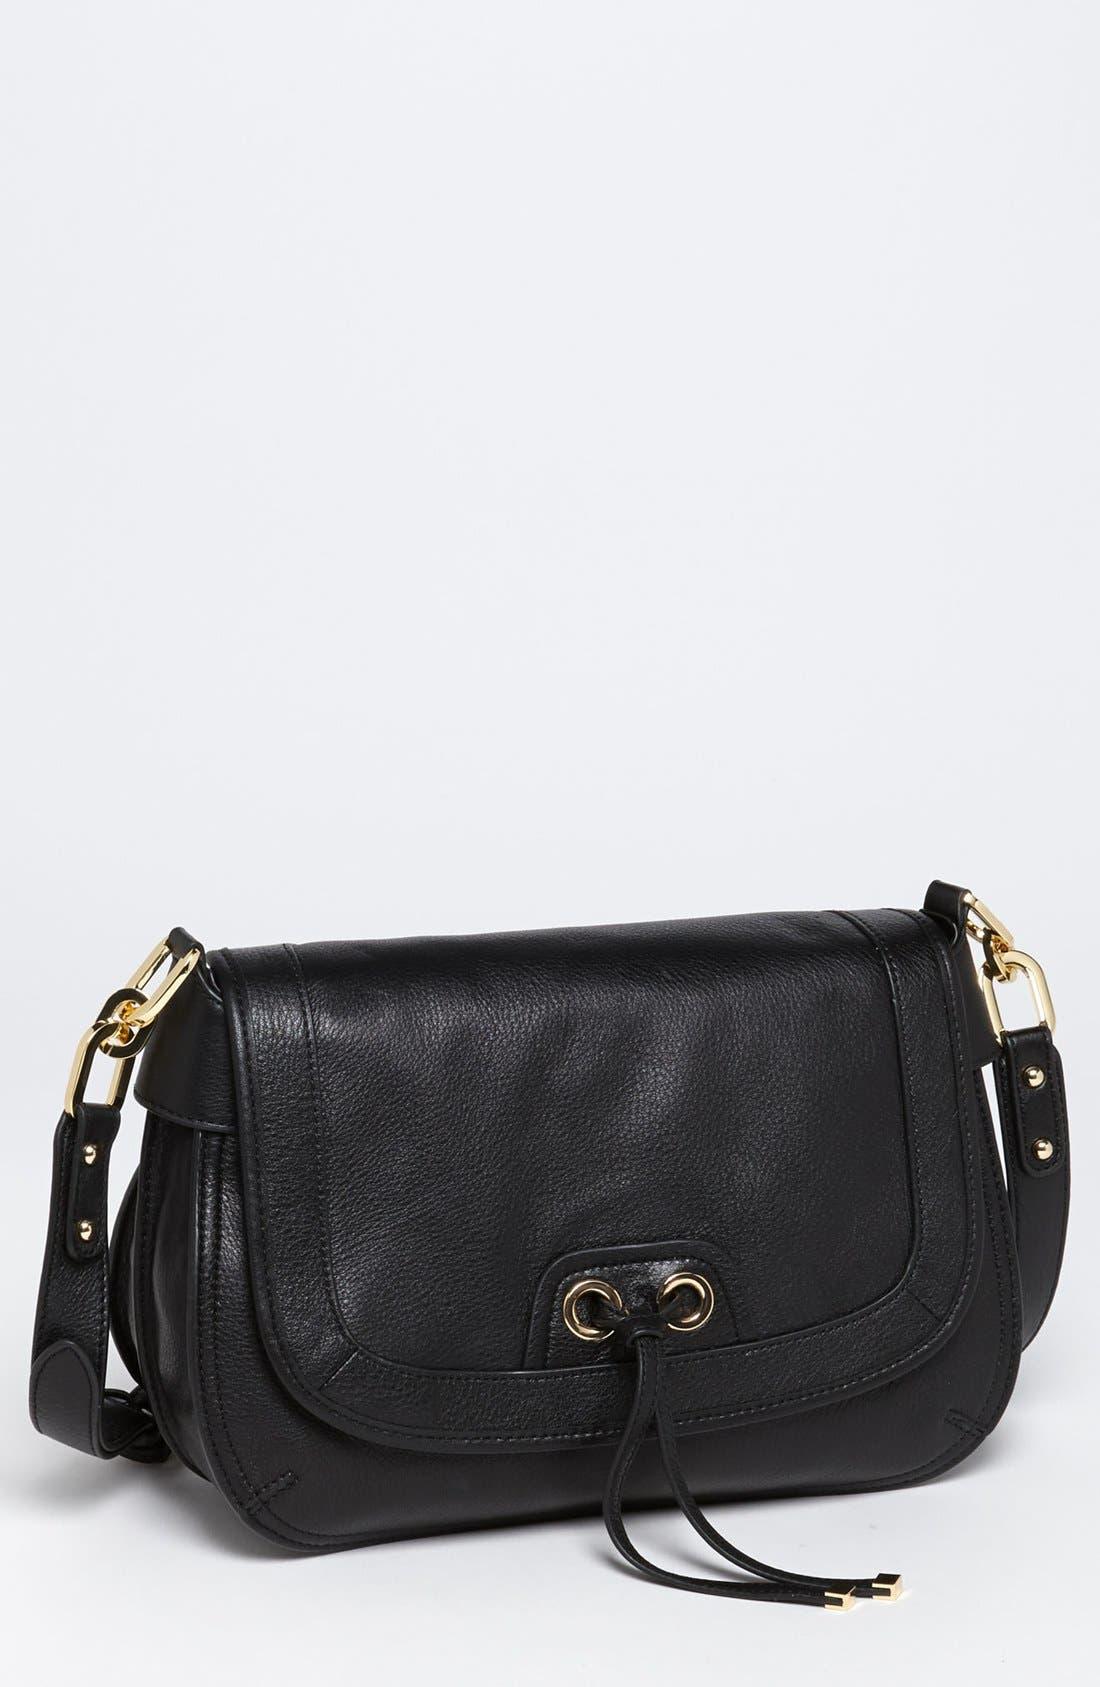 Main Image - Perlina 'Simone' Leather Crossbody Bag